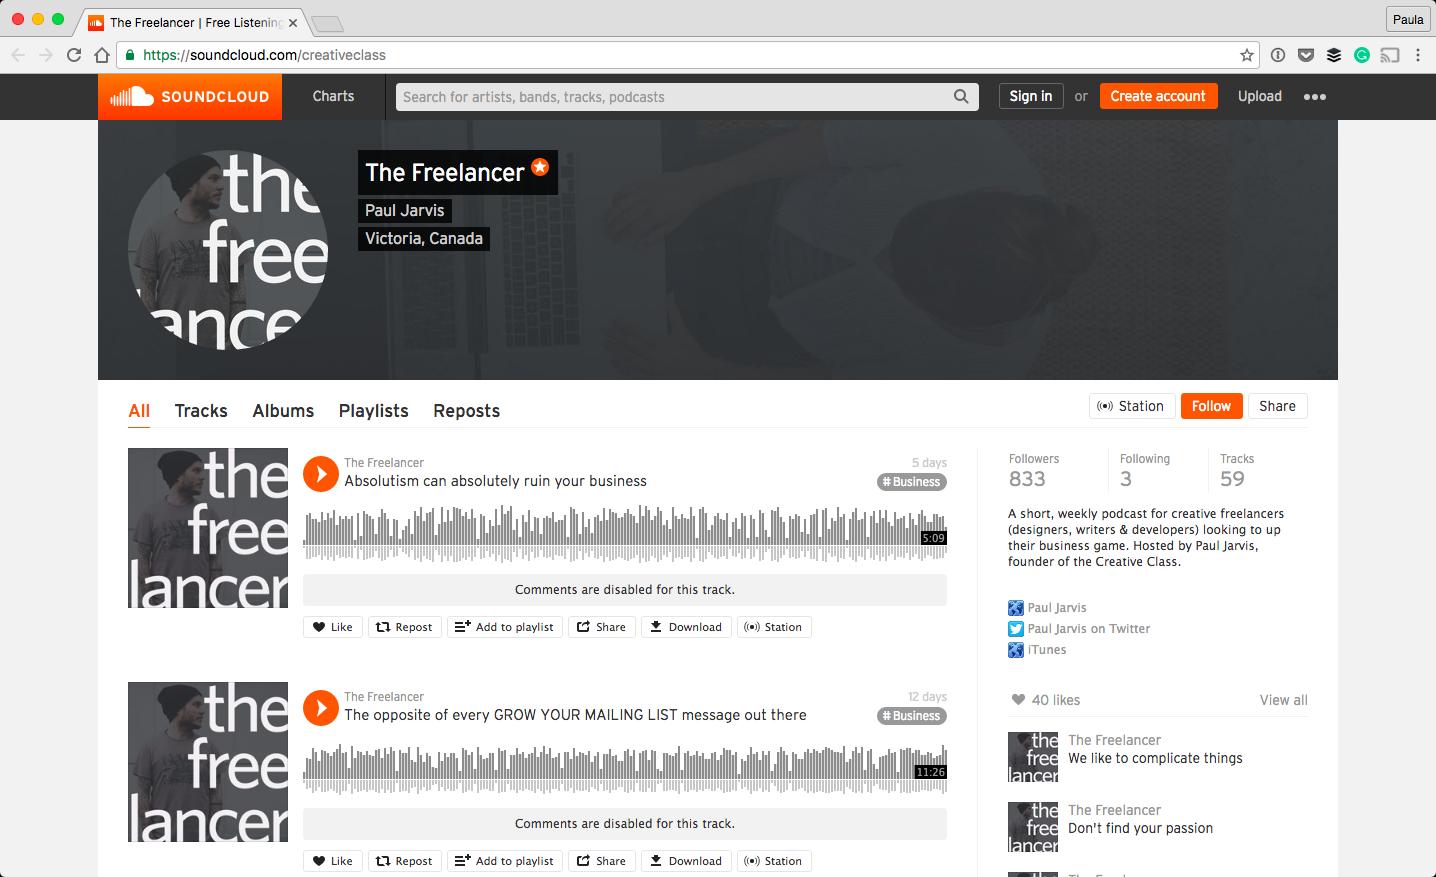 the-freelancer-free-listening-on-soundcloud-2016-10-02-02-47-20